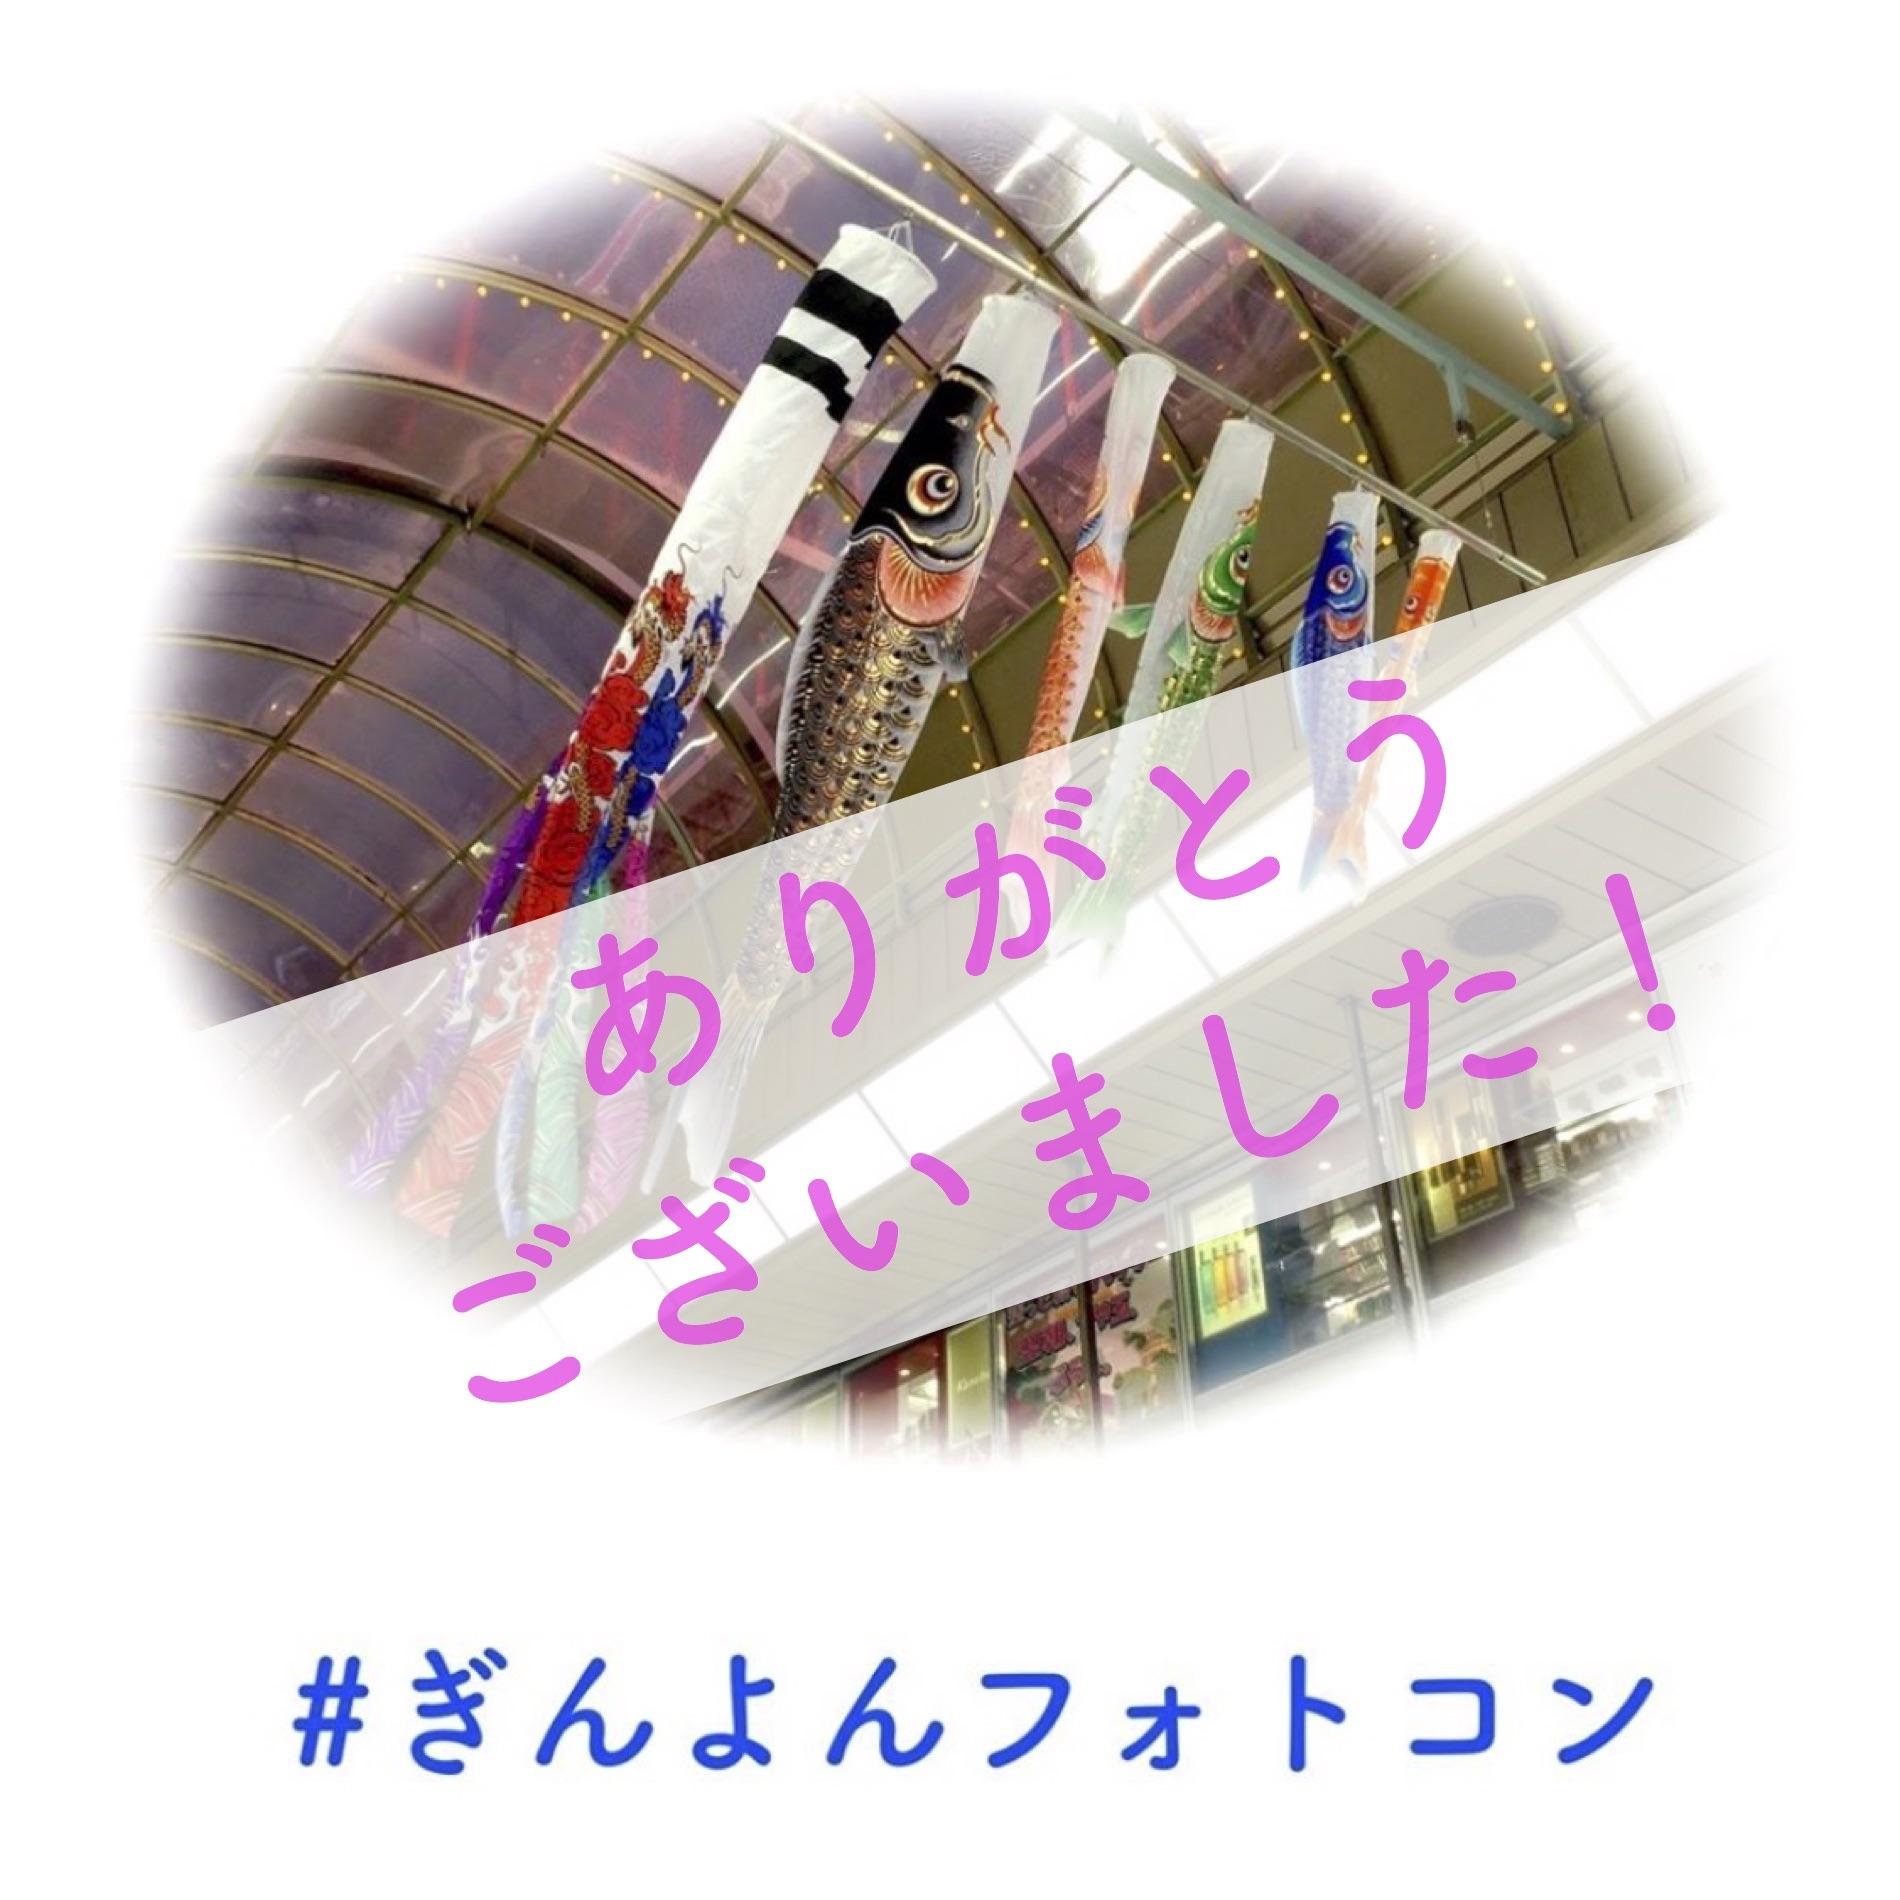 PhotoConClose